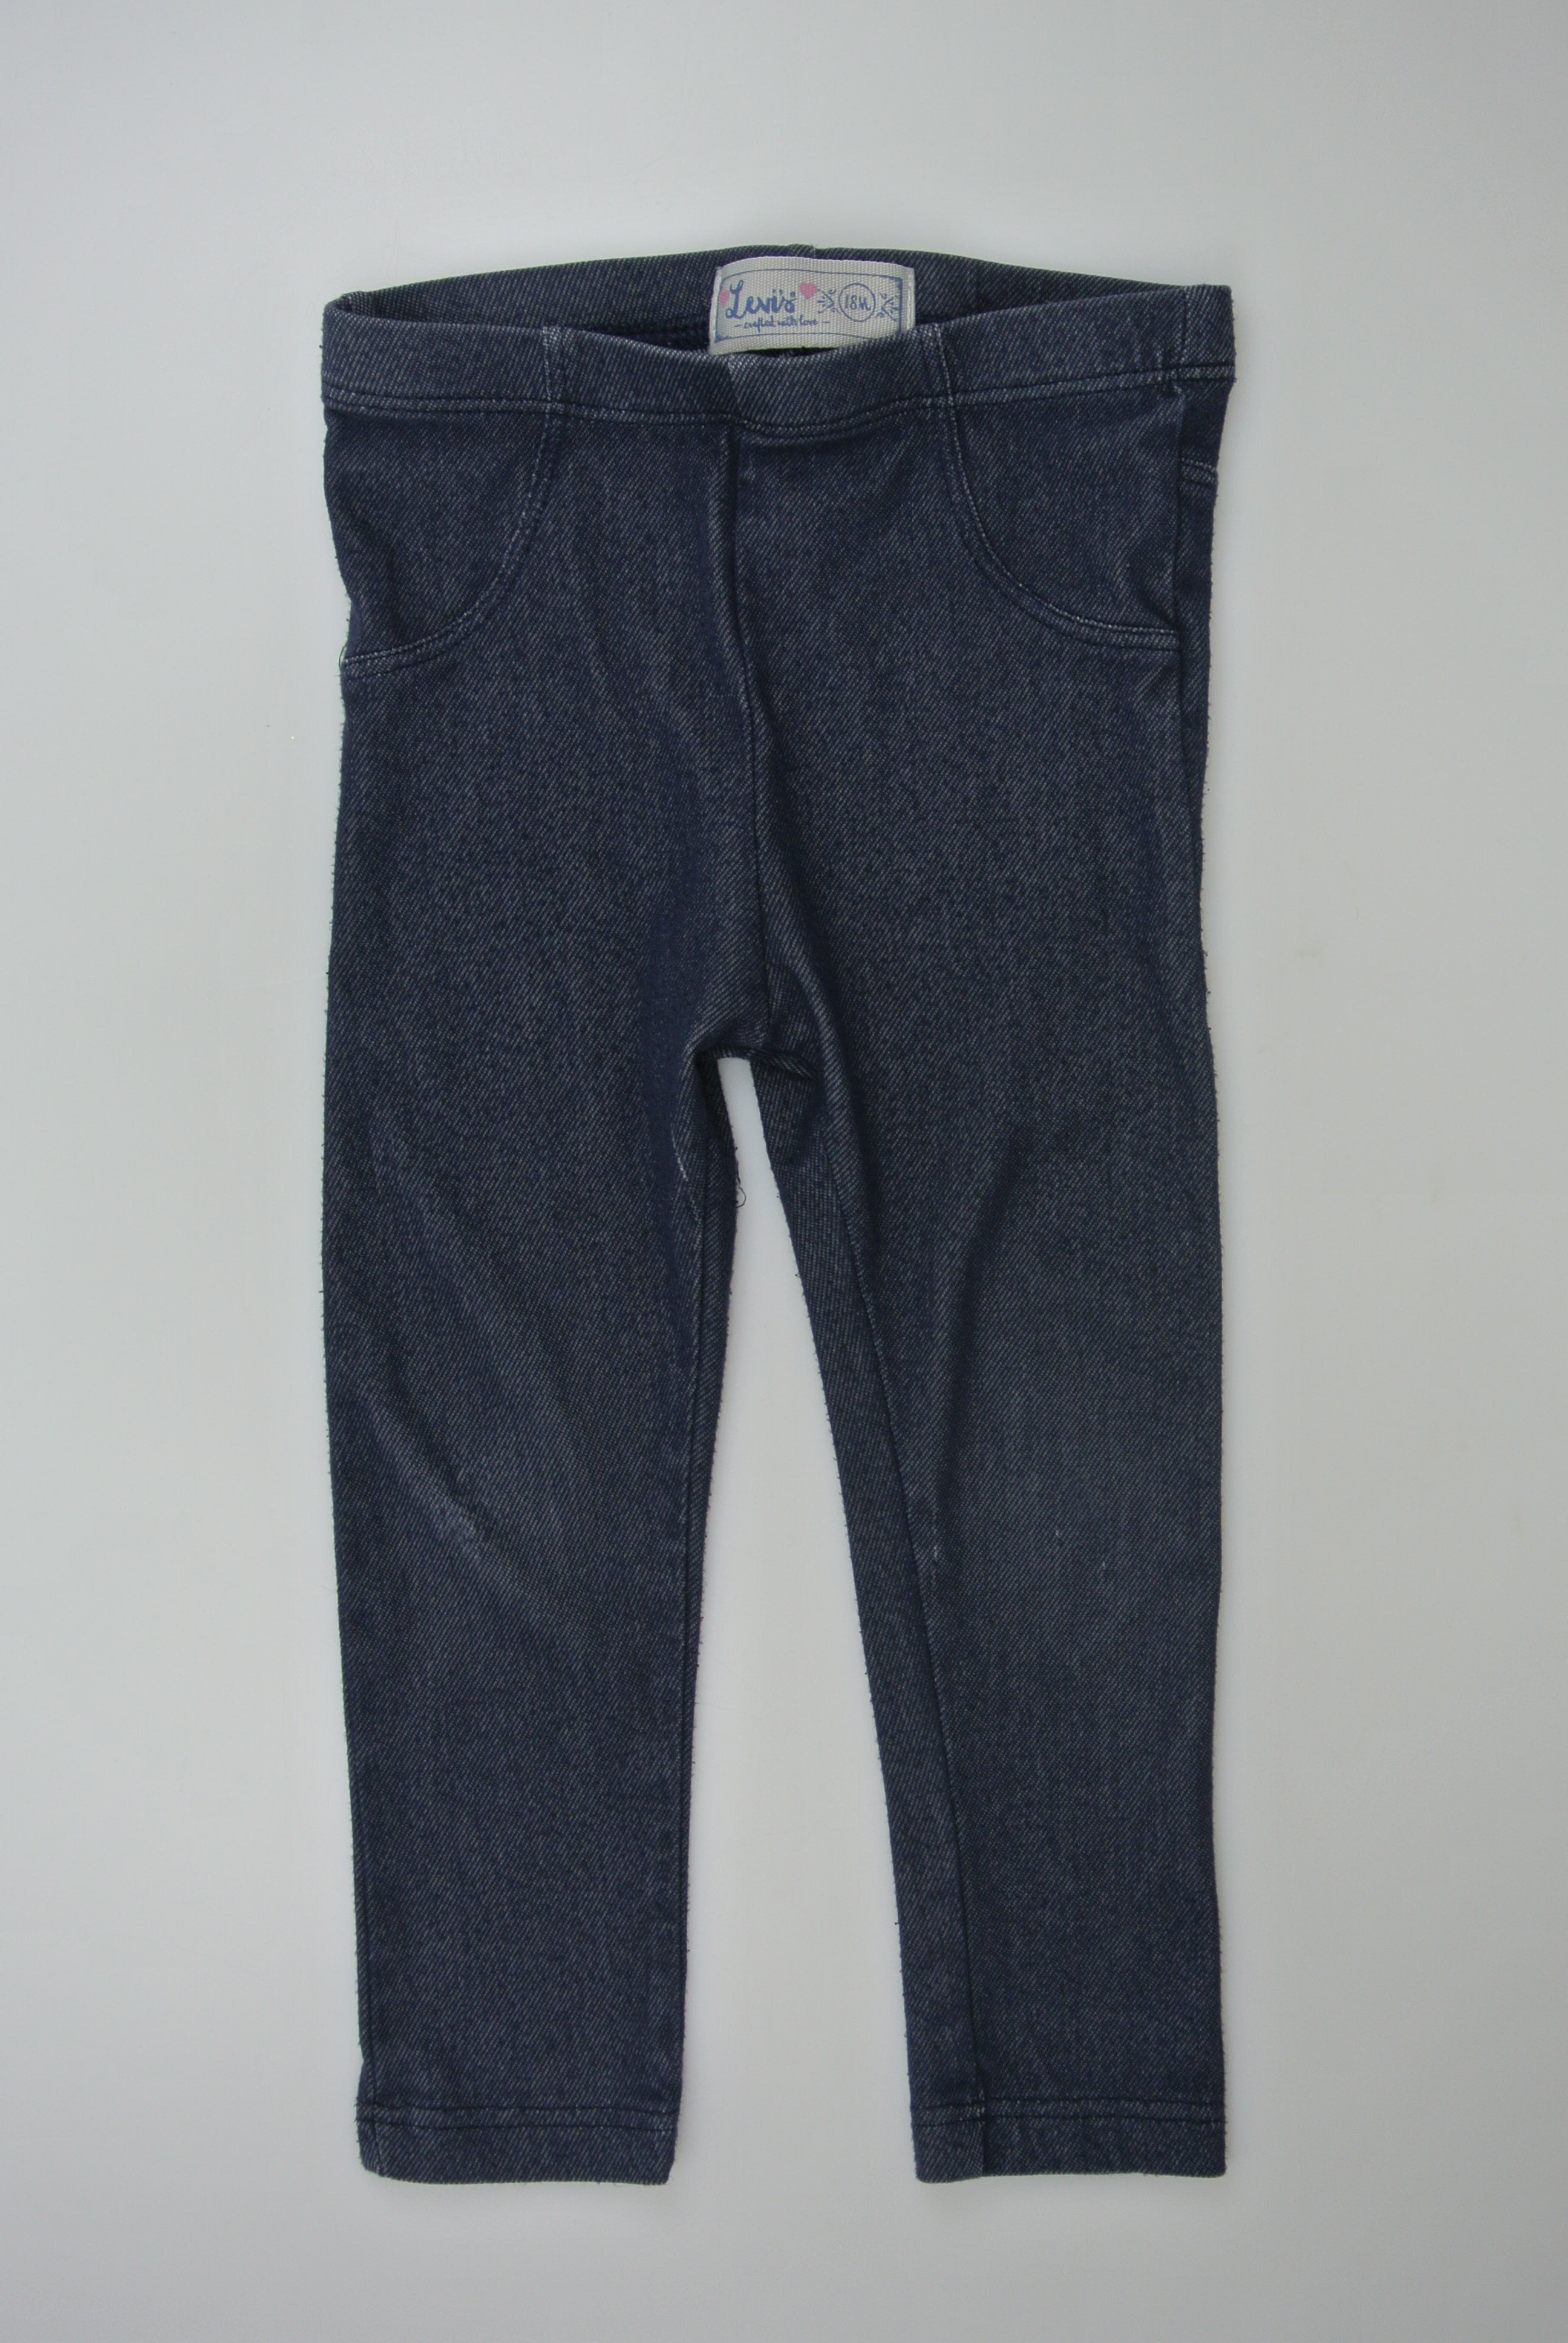 Levis bukser str 86 pige 18m